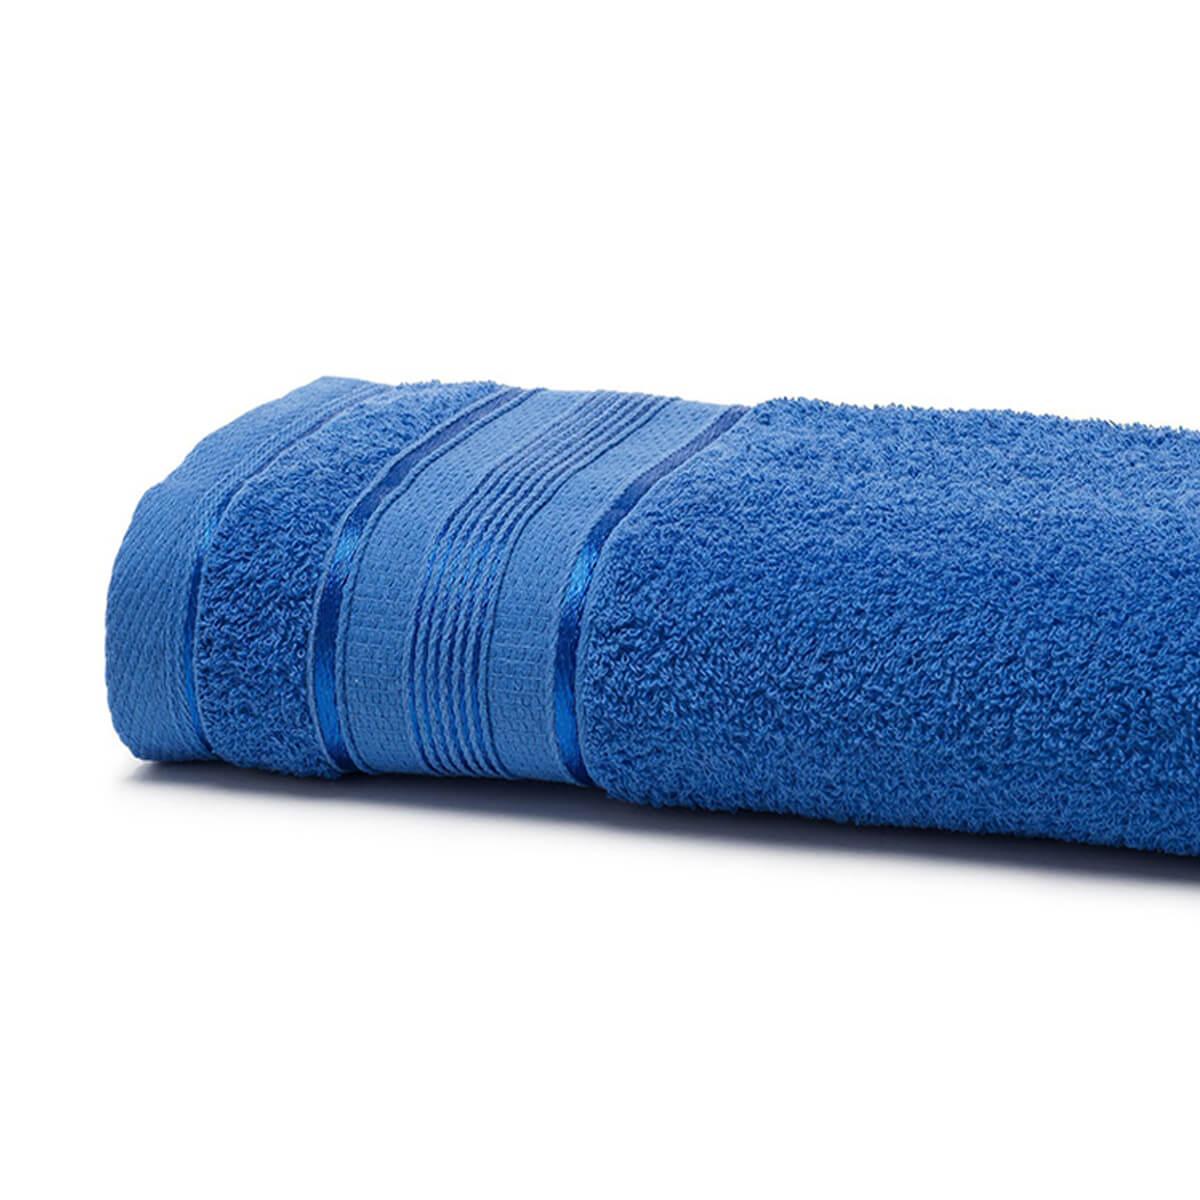 Toalha de Rosto Felpuda Royal Knut Azul